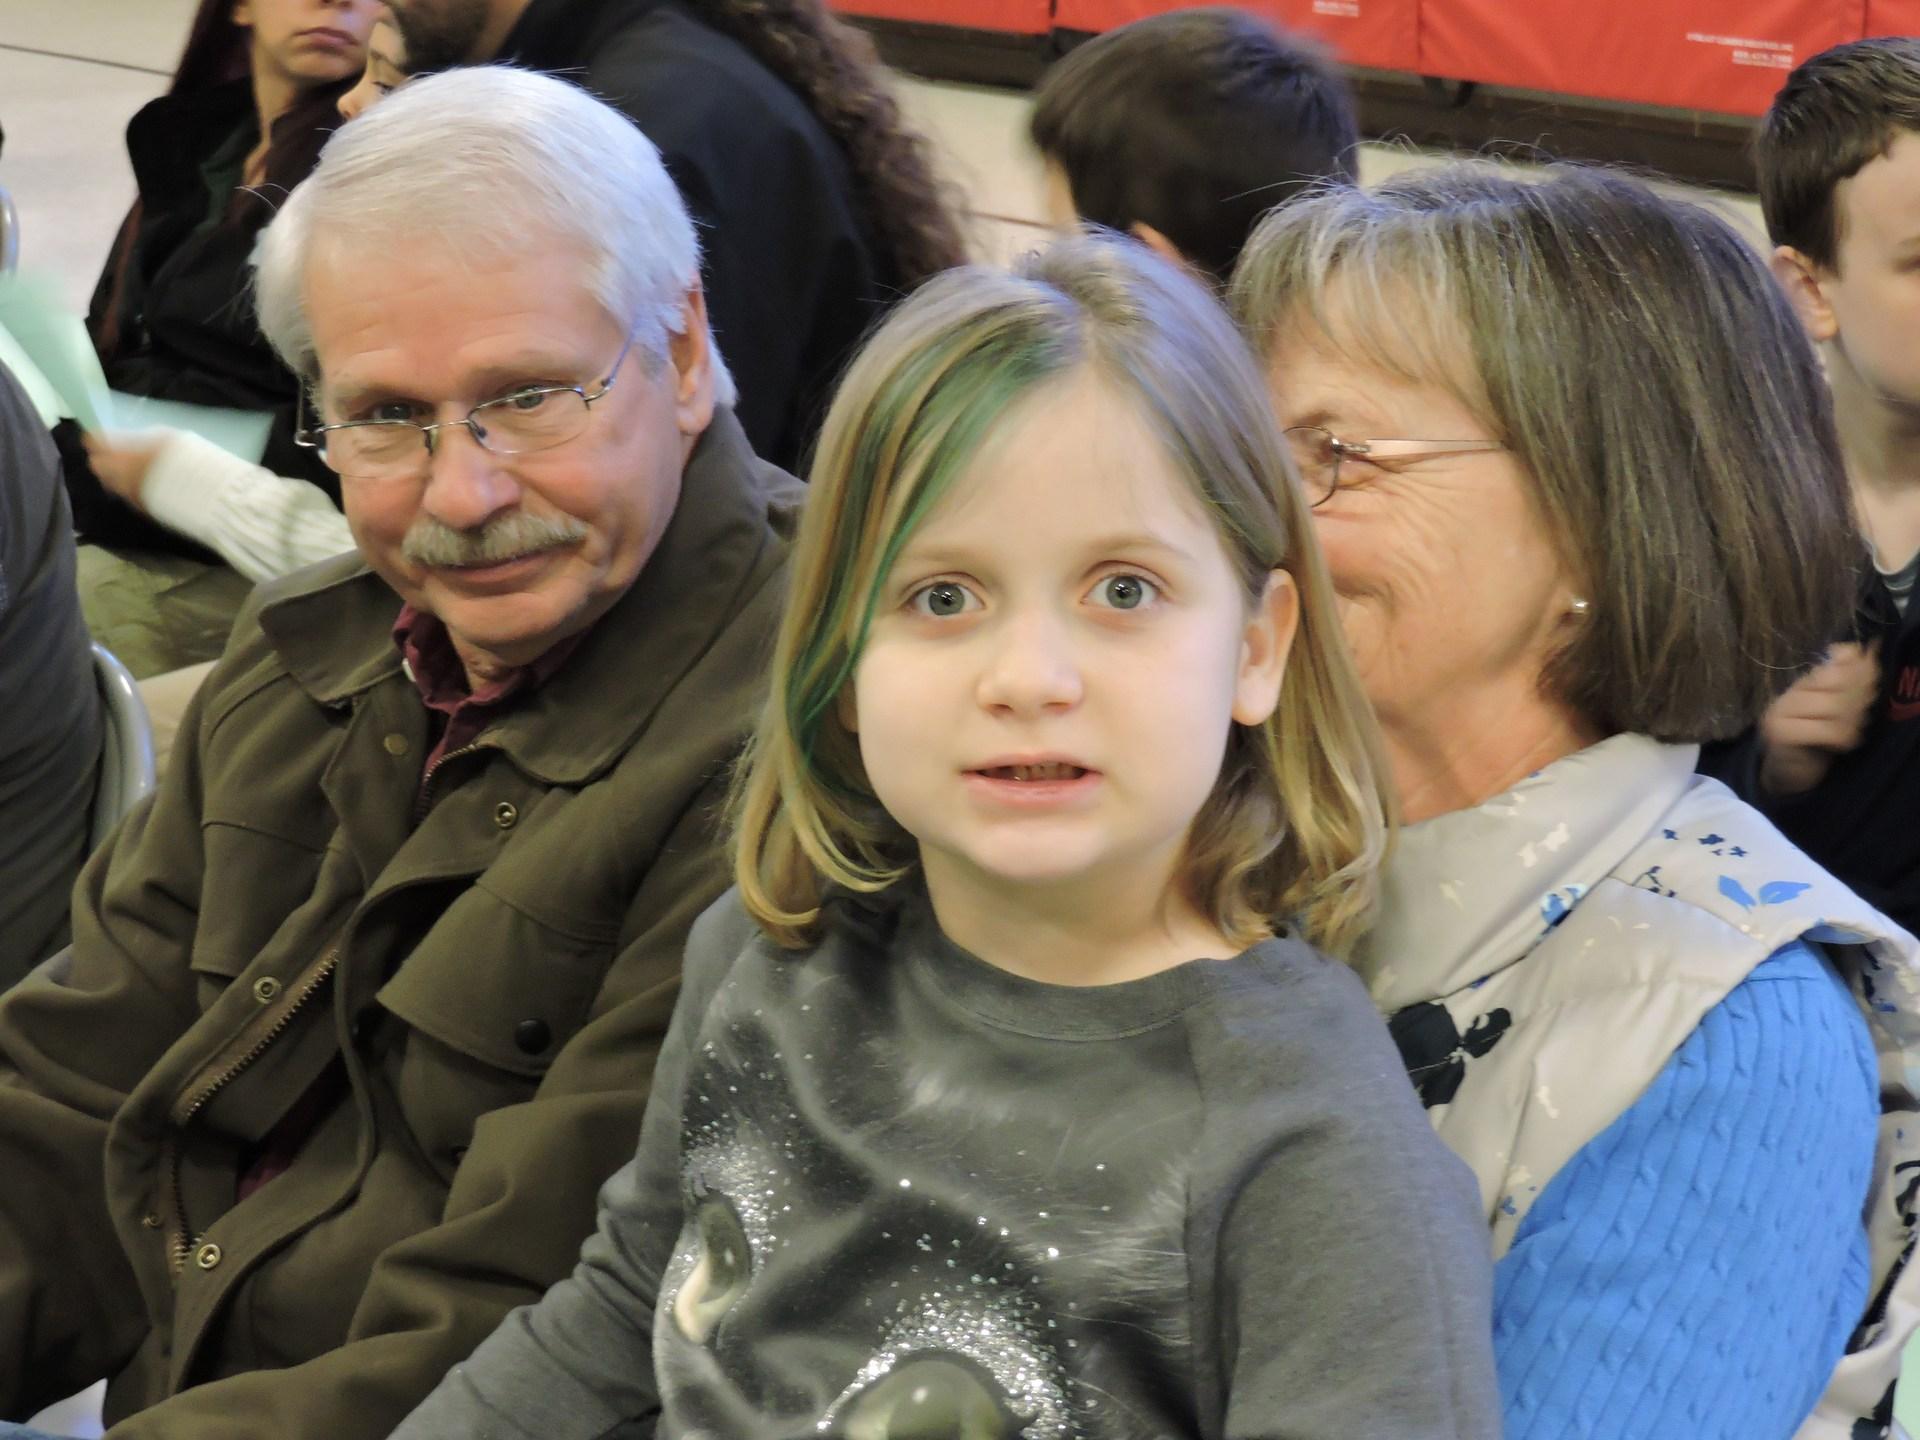 Terrific Kid and Grandparents